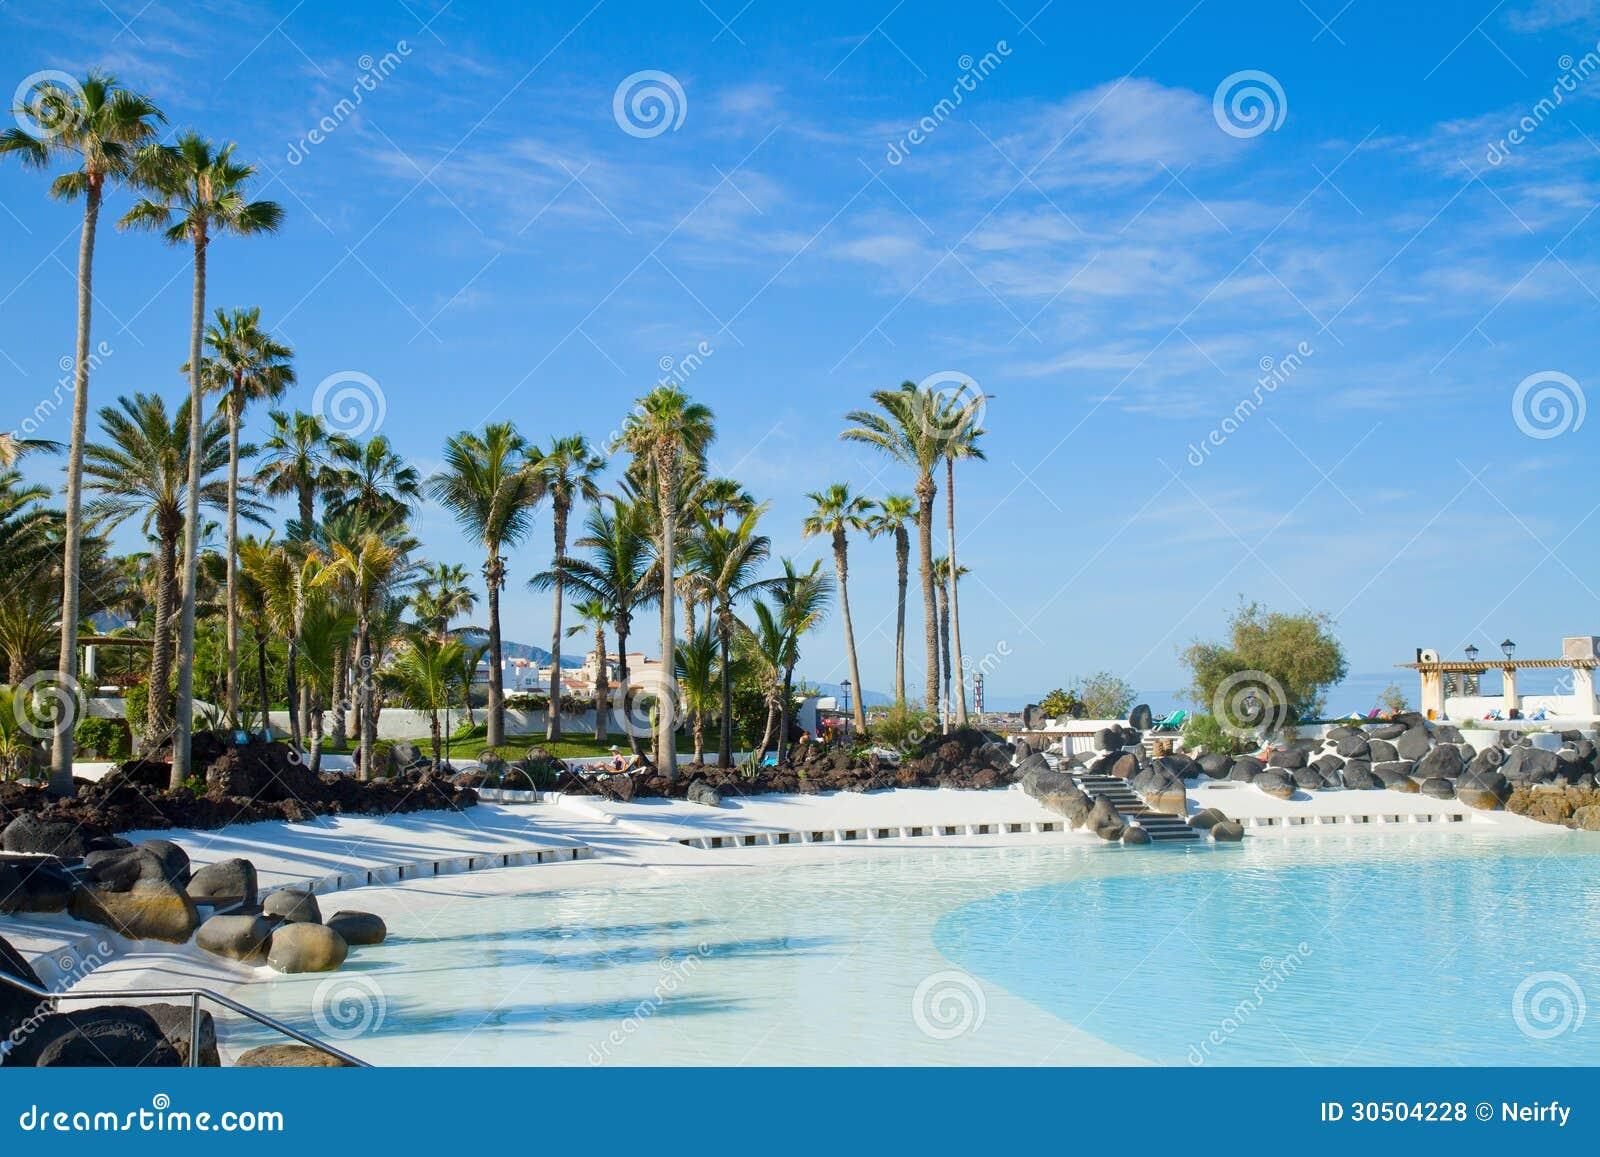 Public pools at puerto cruz tenerife spain royalty free - Swimming pool in spanish language ...